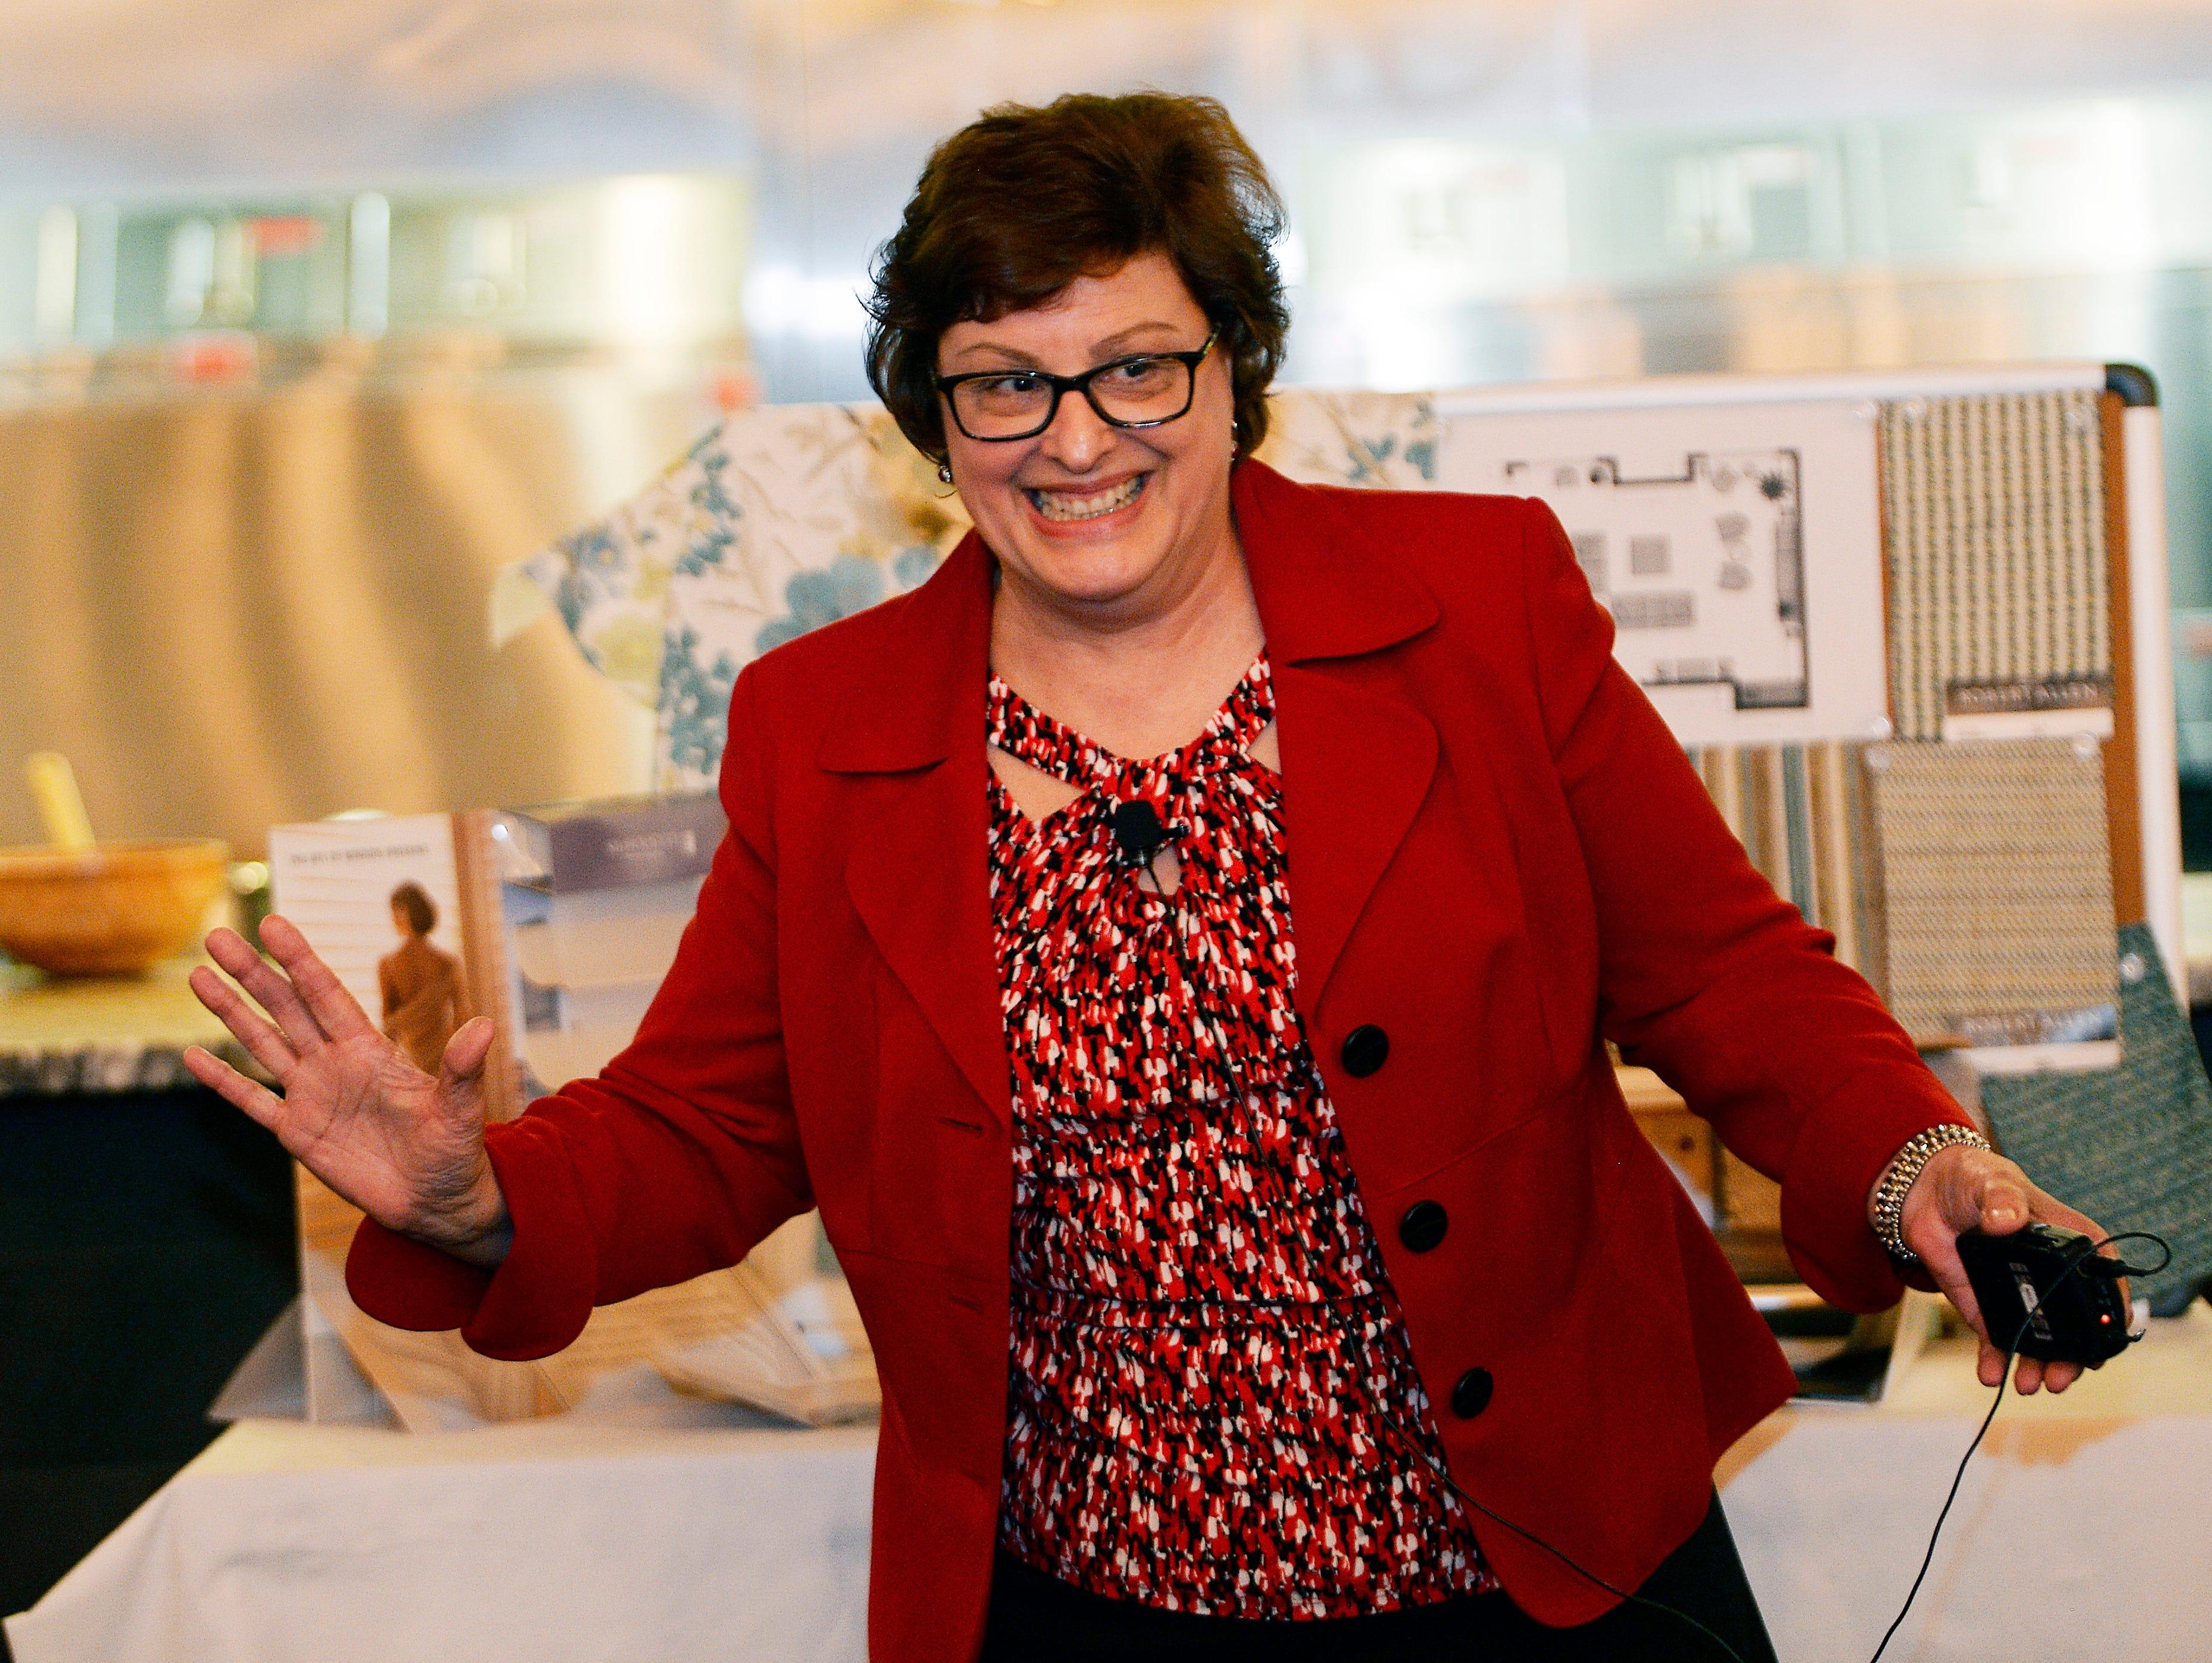 Gayle McNally, interior designer, gives her presentation on how to design.